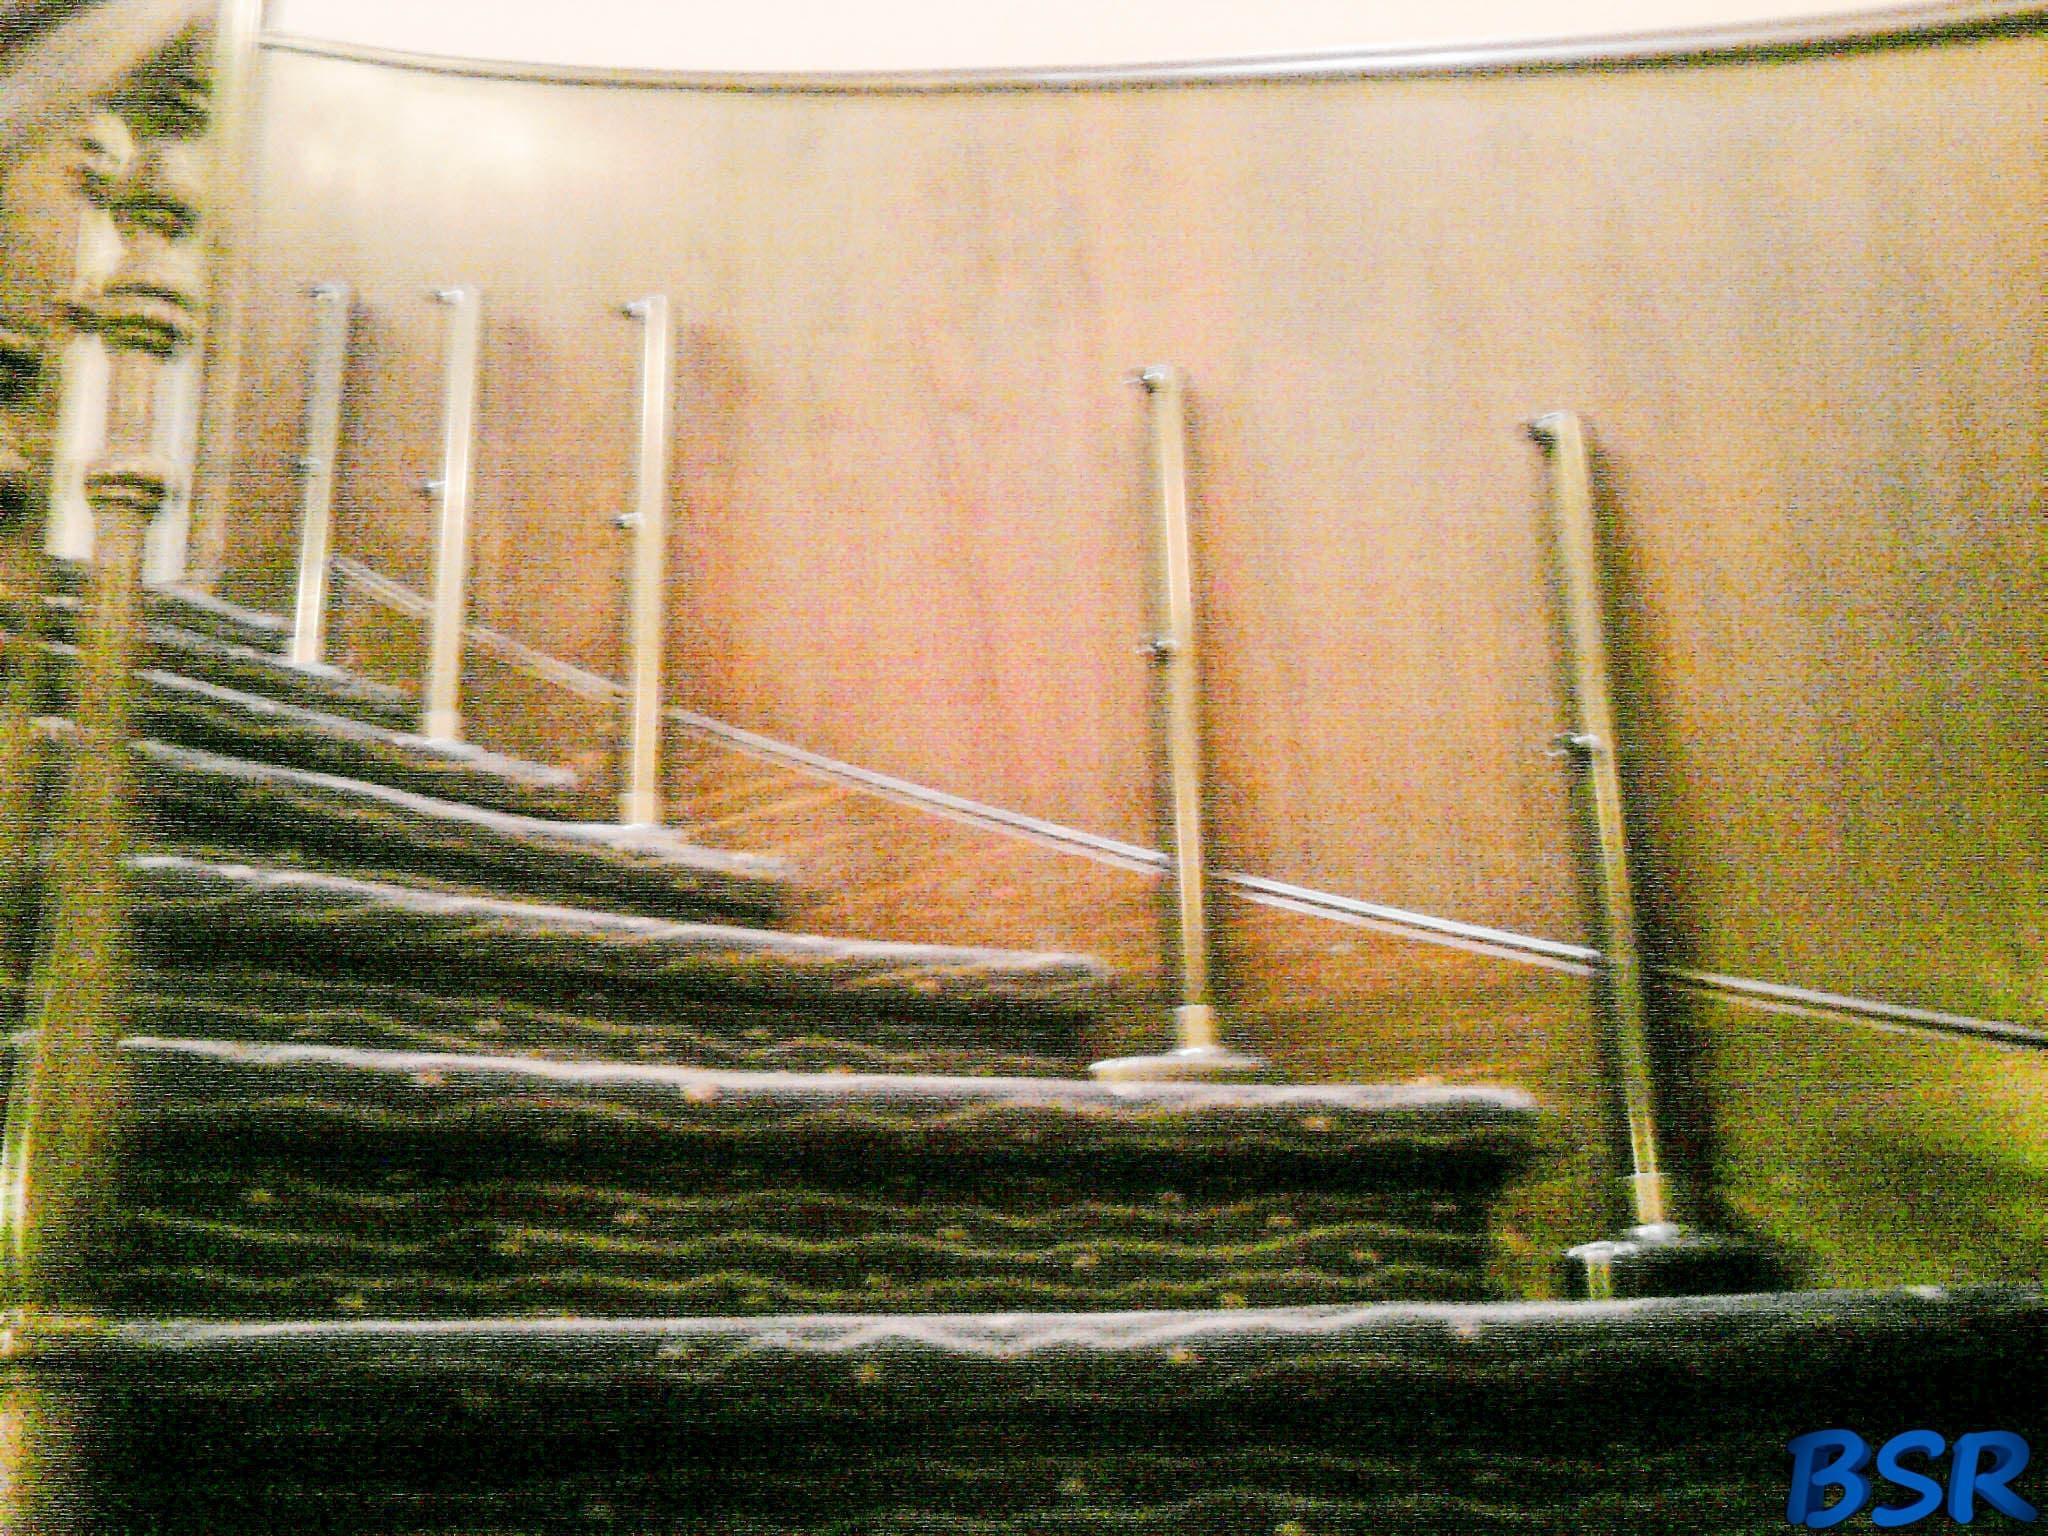 Monte Escalier BSR 014